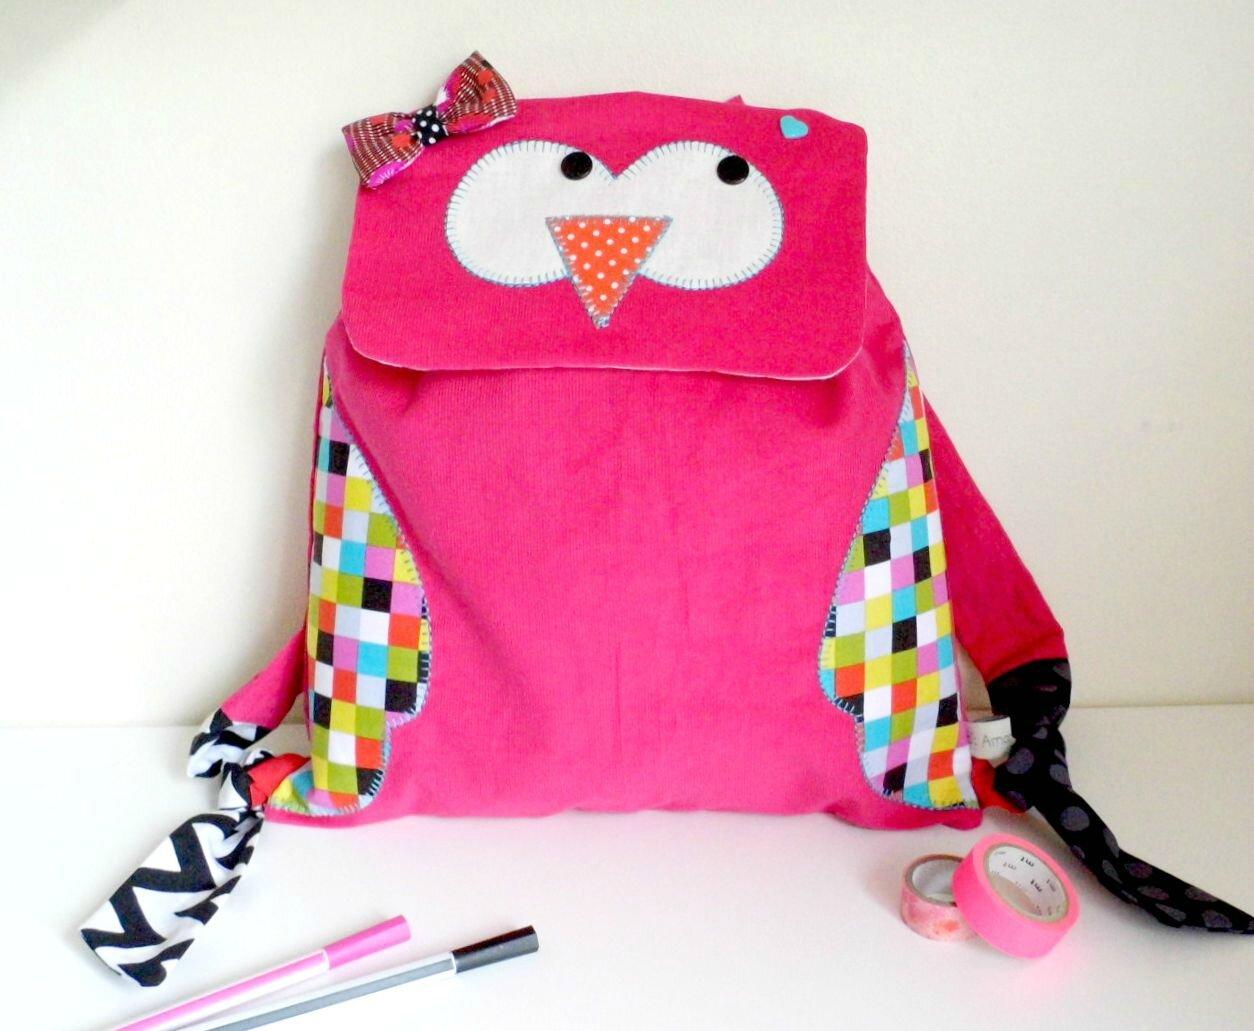 Sac à gouter sac à dos maternelle hibou chouette rose vif